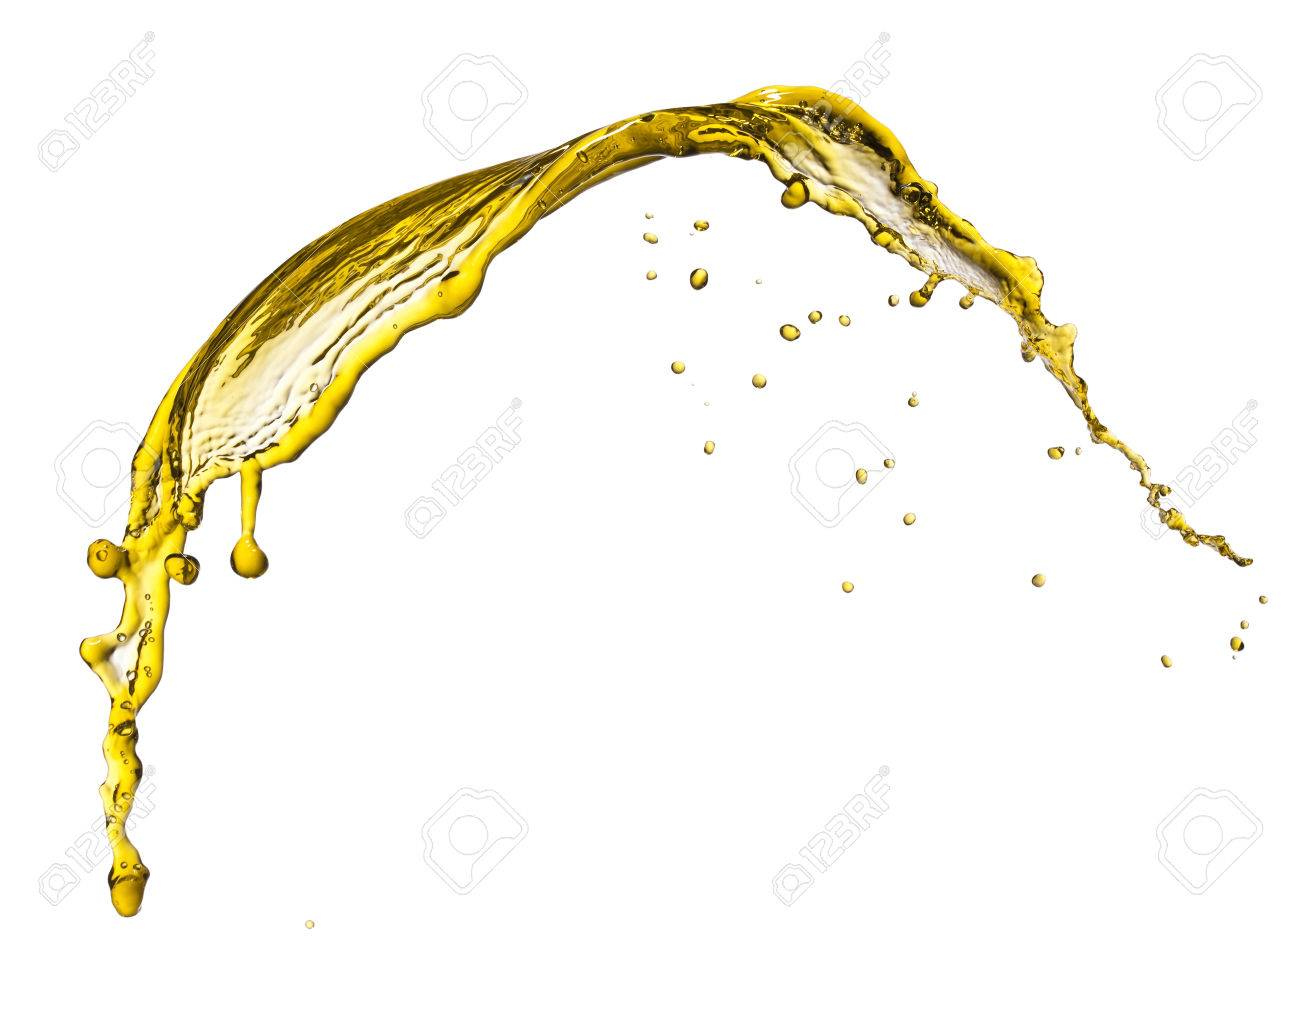 Flying splash yellow liquid on a white background - 27754908